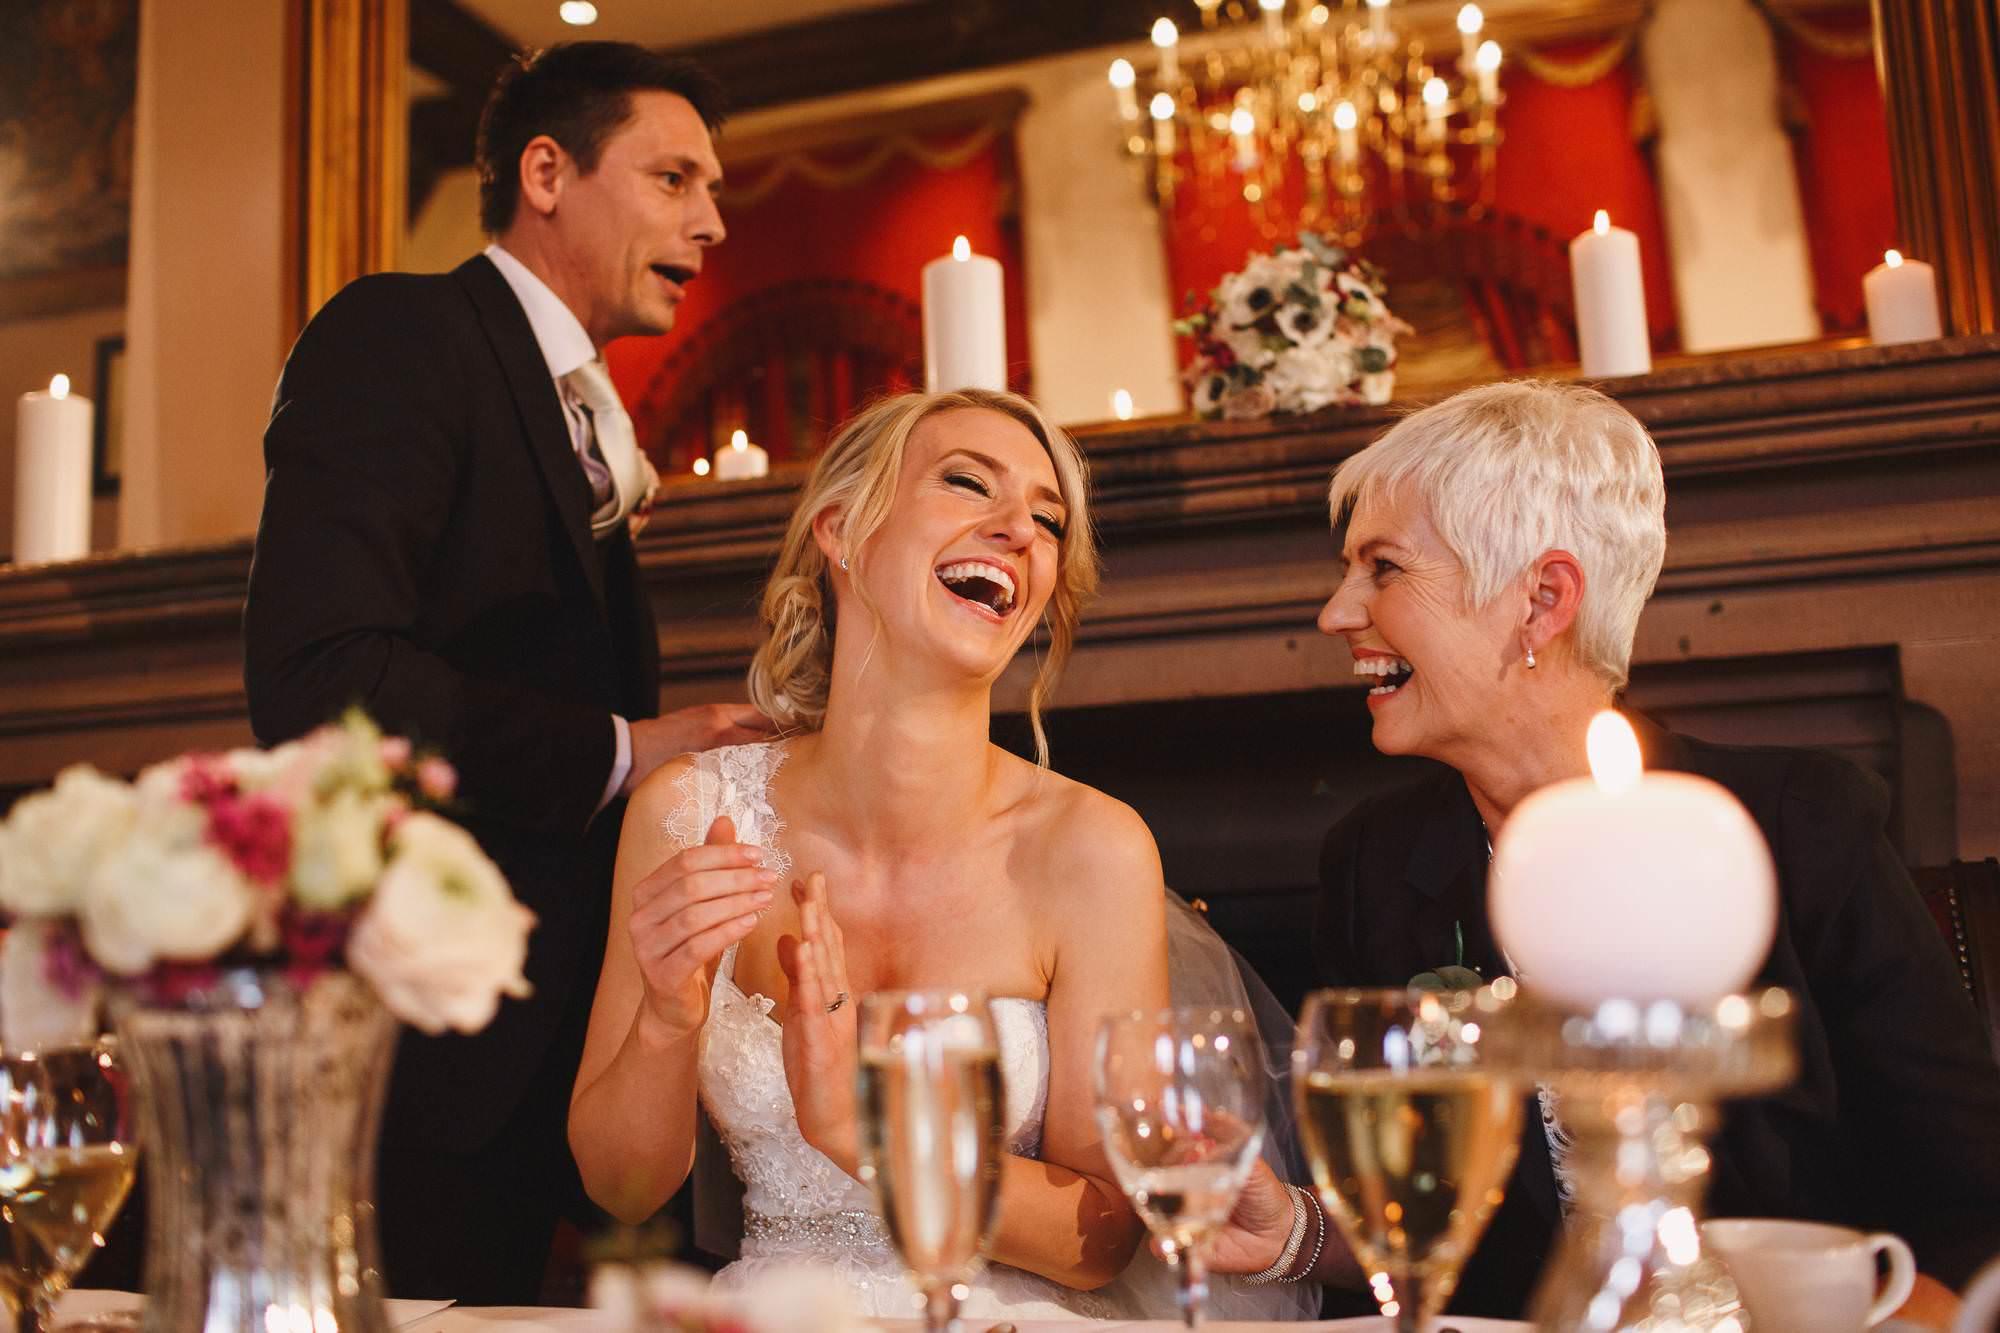 Wedding speeches at Peckforton Castle, Cheshire